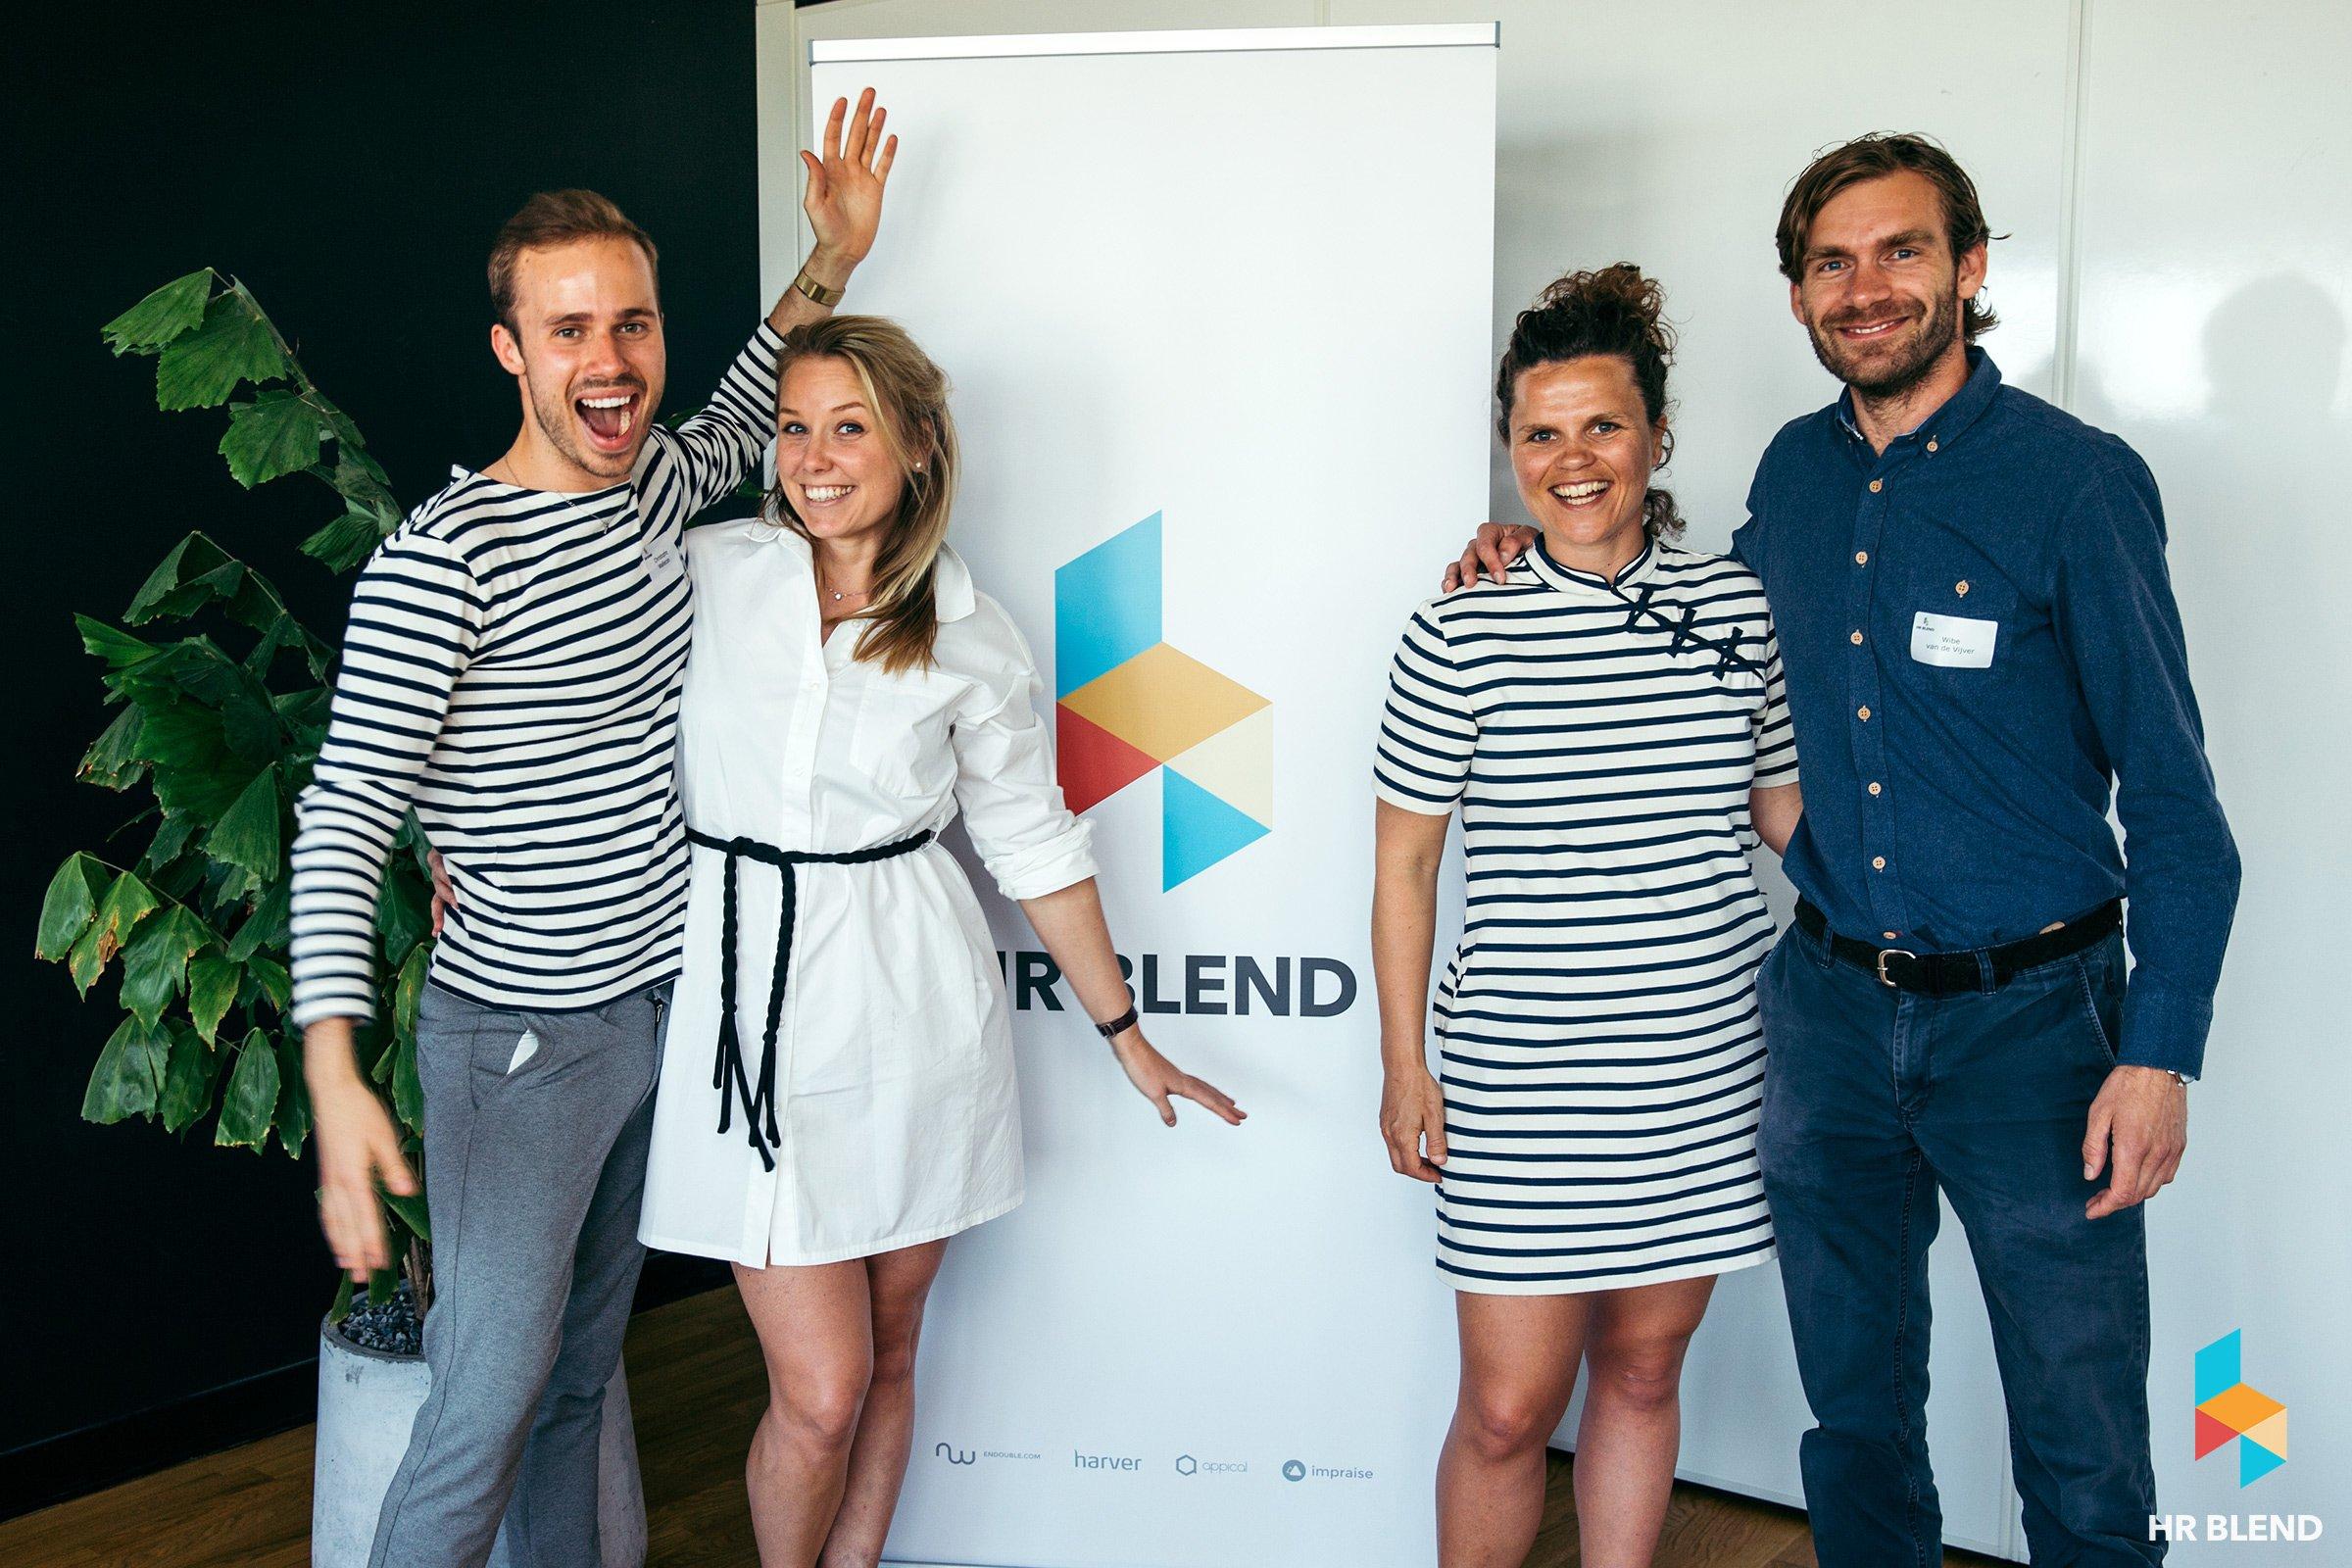 HR Blend - partners